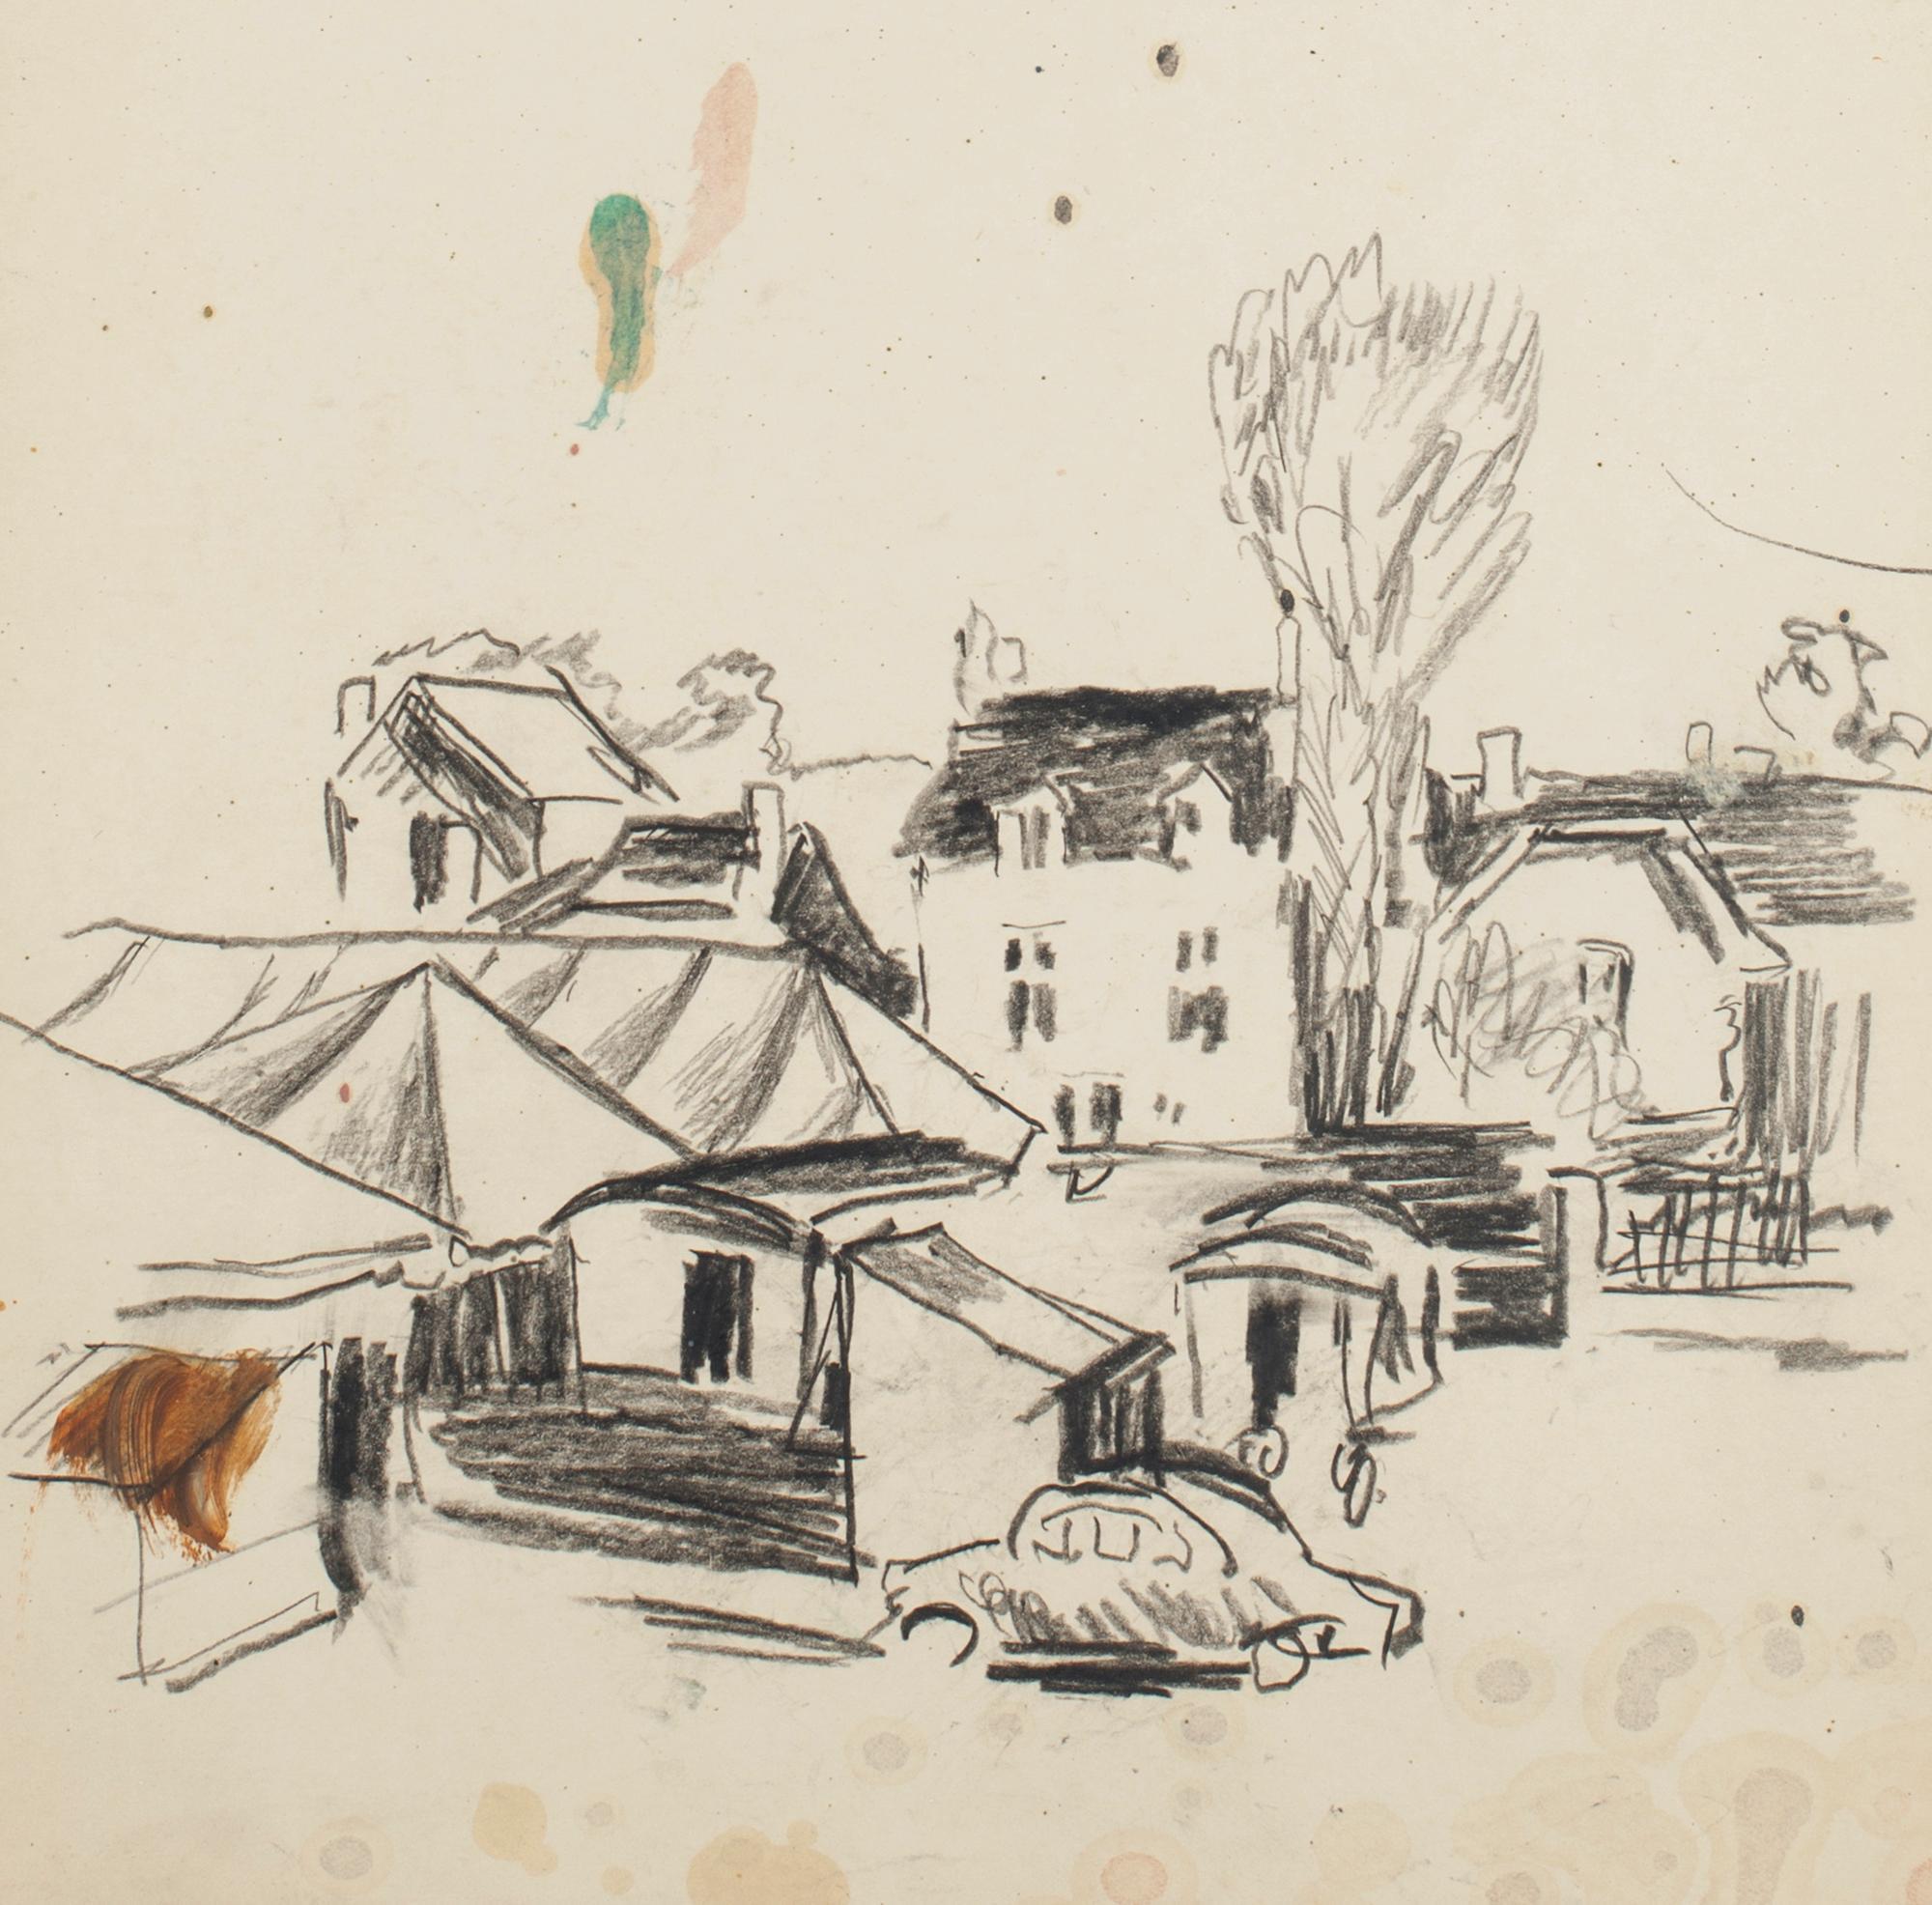 City - Original Mixed Media by N. Czinober - mid 20th Century